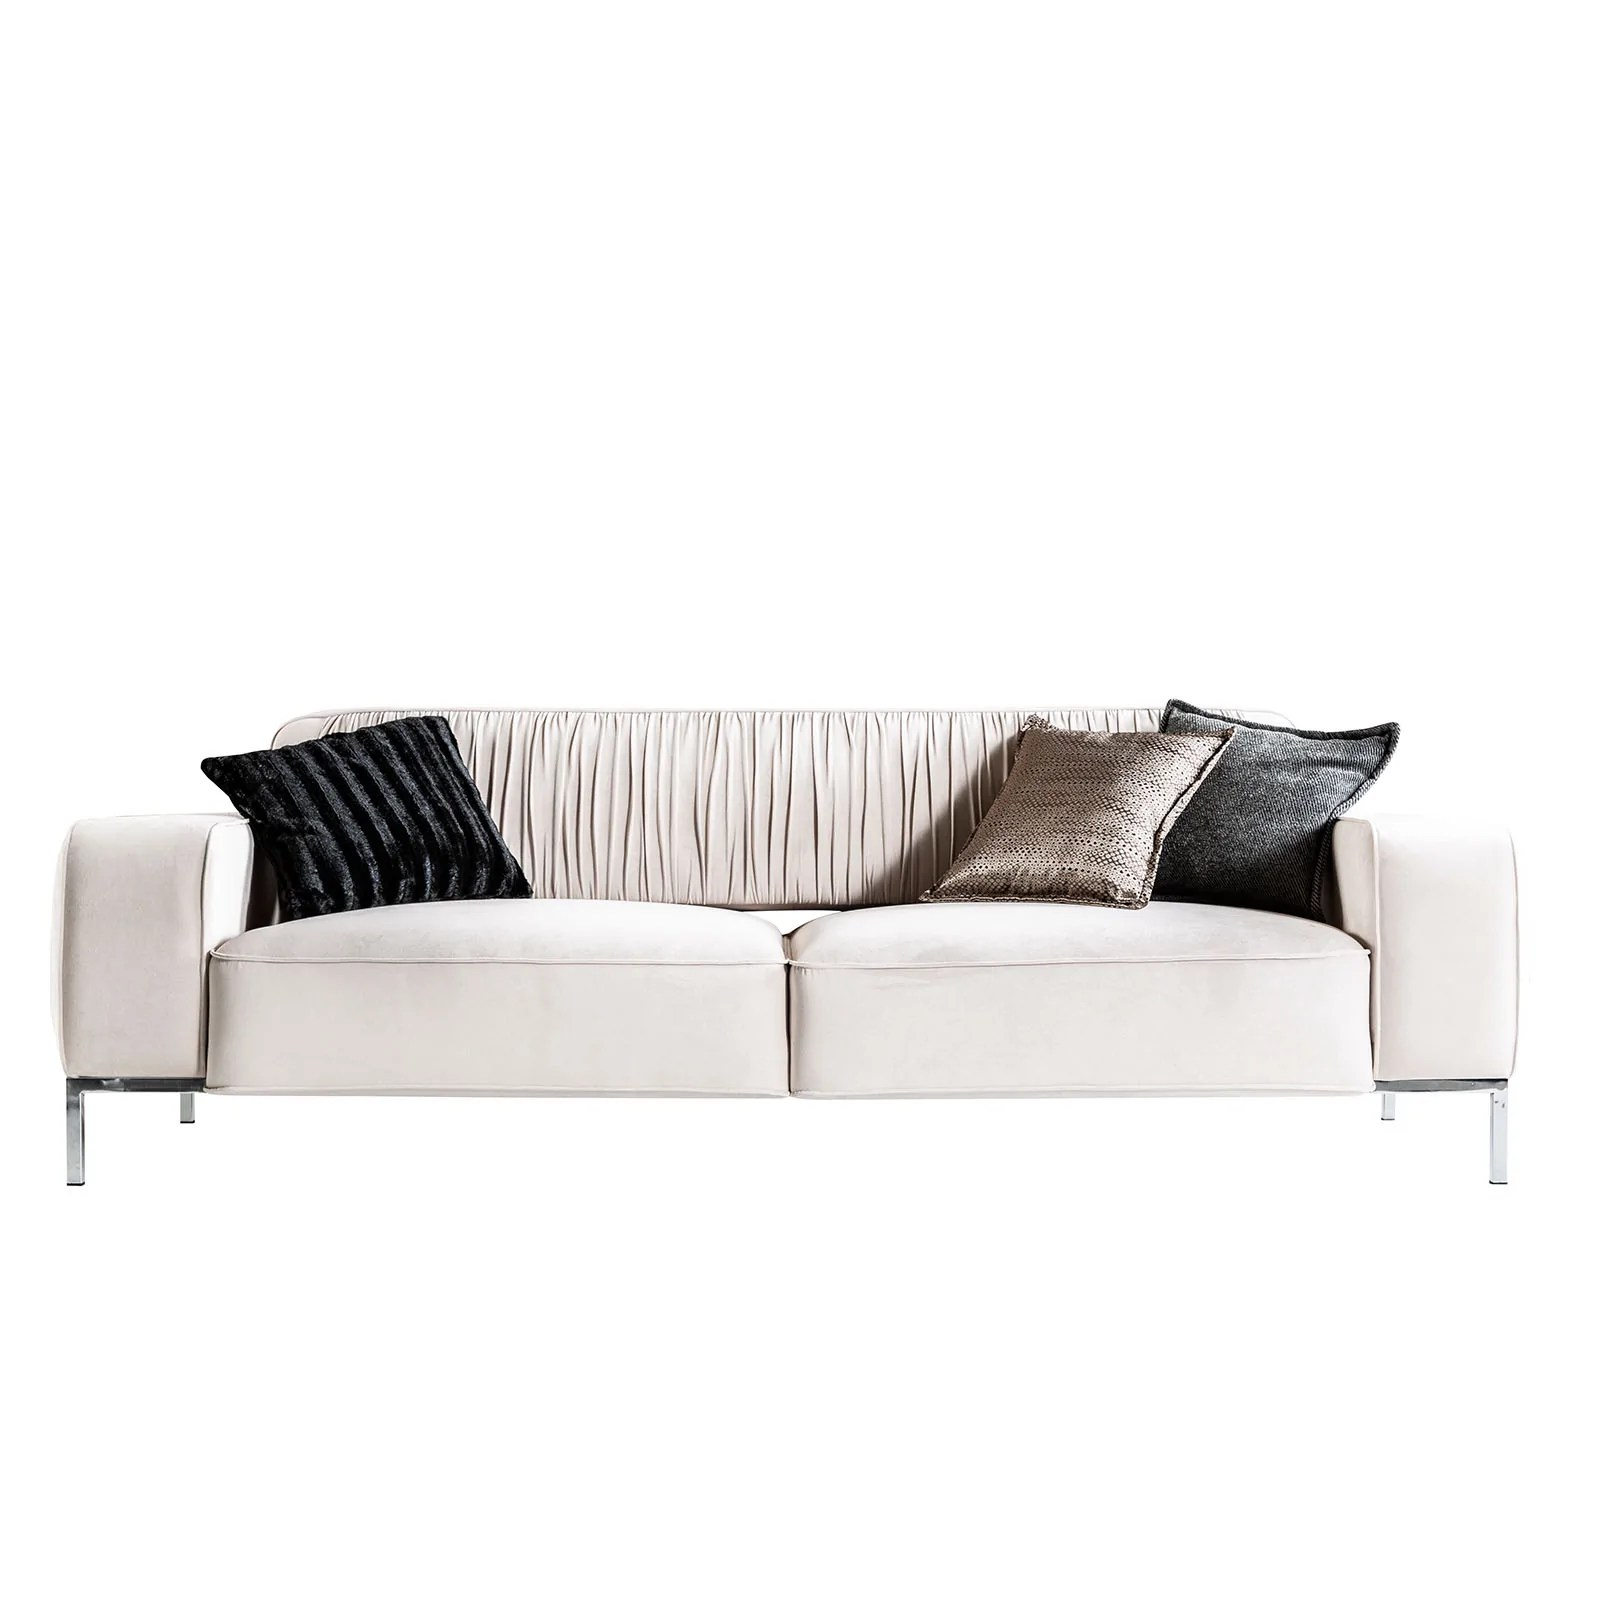 3+3+1+1 BERETTA sofa set Beretta001 | Online Furniture ... on Beretta Outdoor Living id=36468